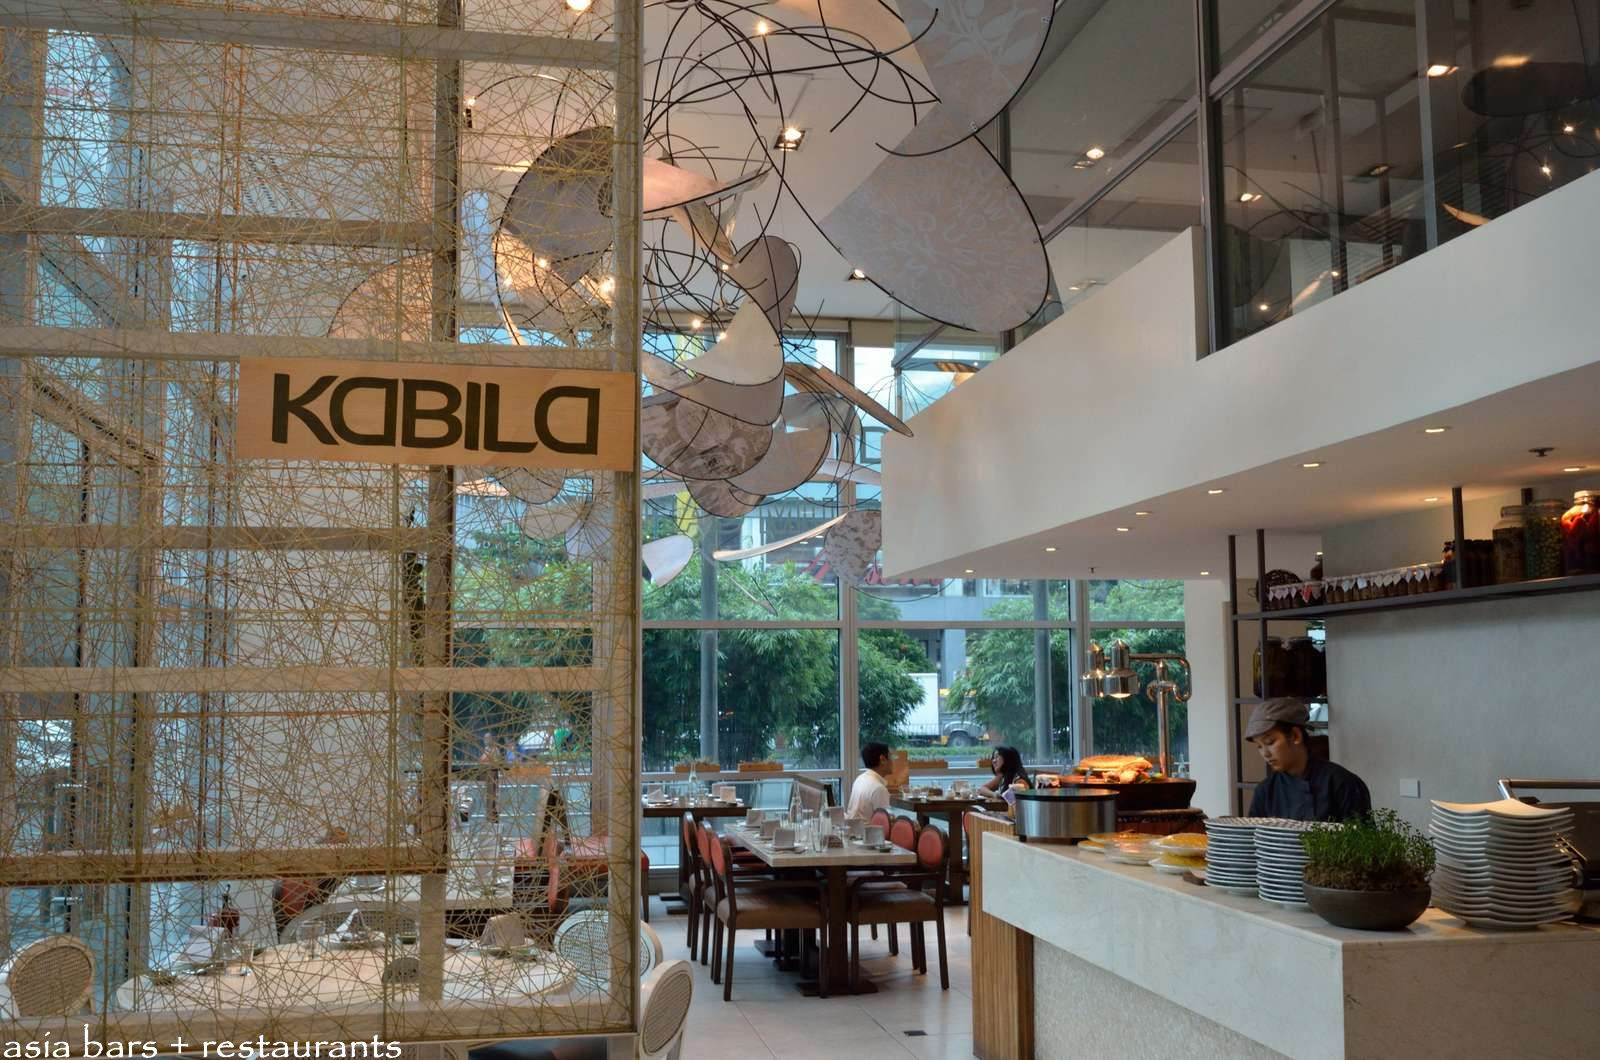 Museum cafe kabila filipino bistro manila asia bars